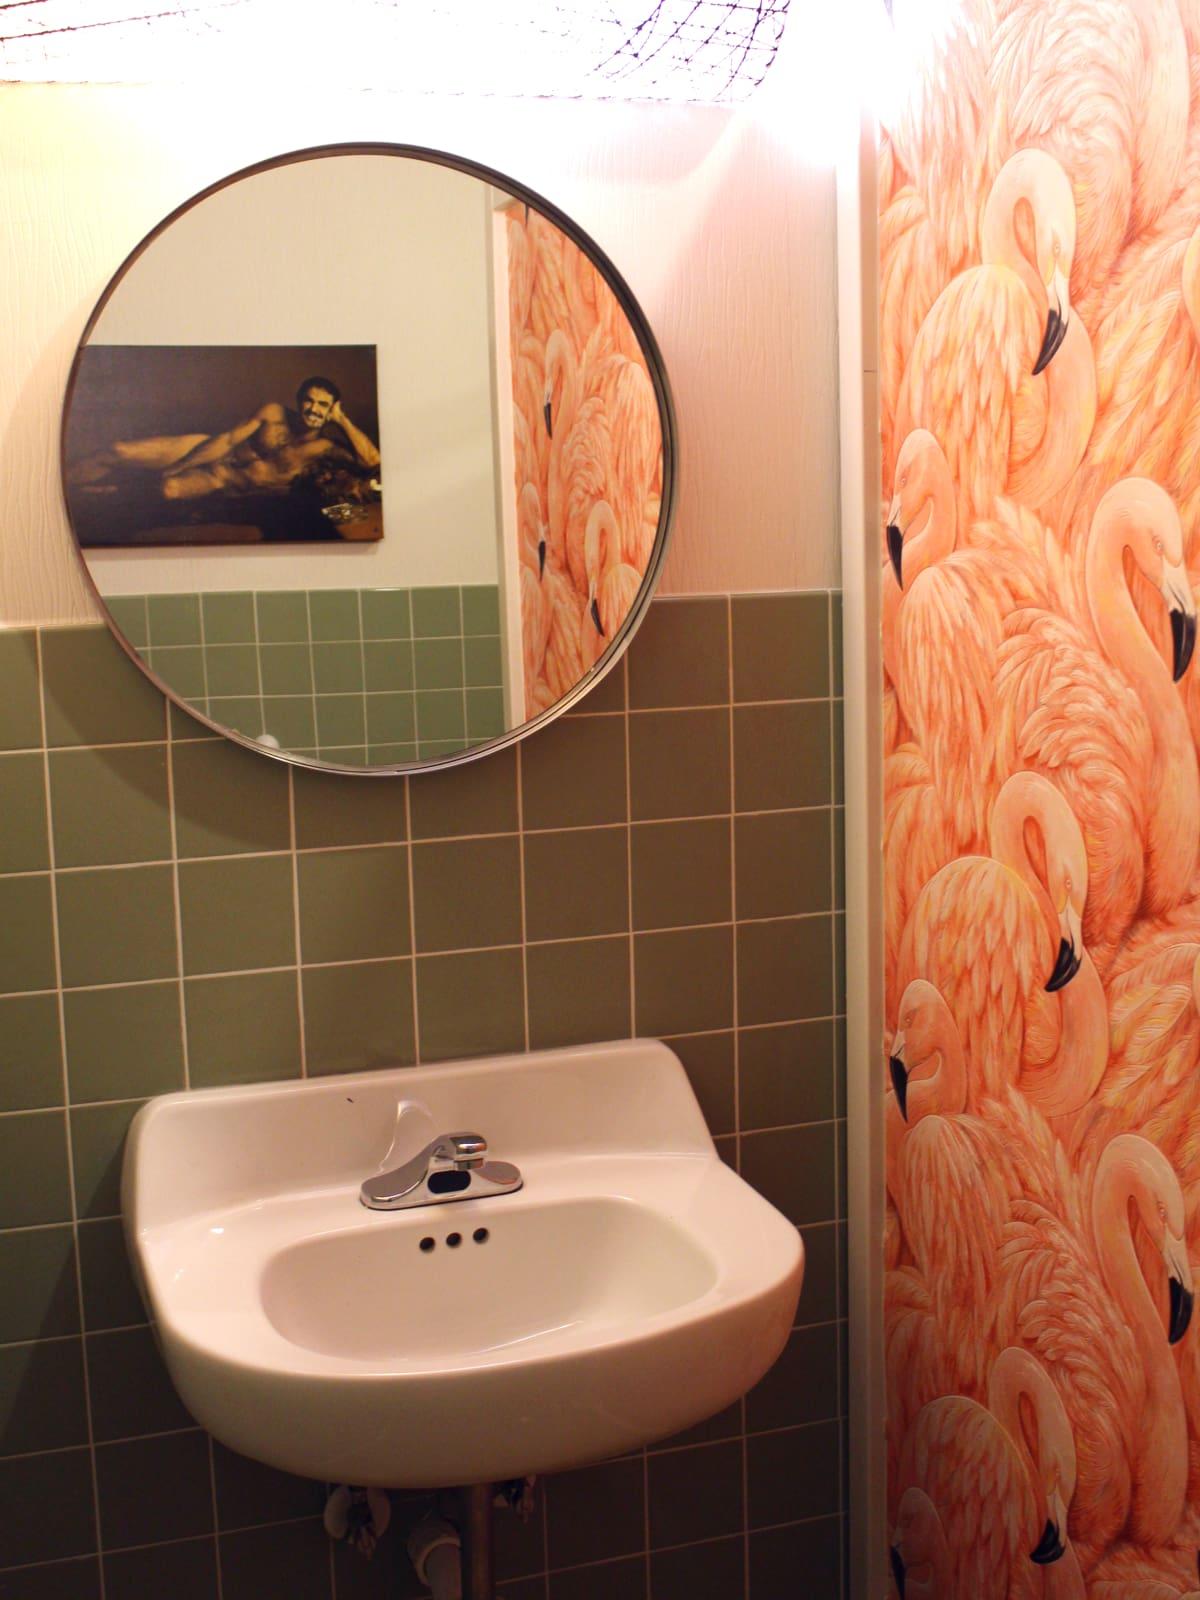 Kitty Cohen's Austin bar women bathroom flamingo